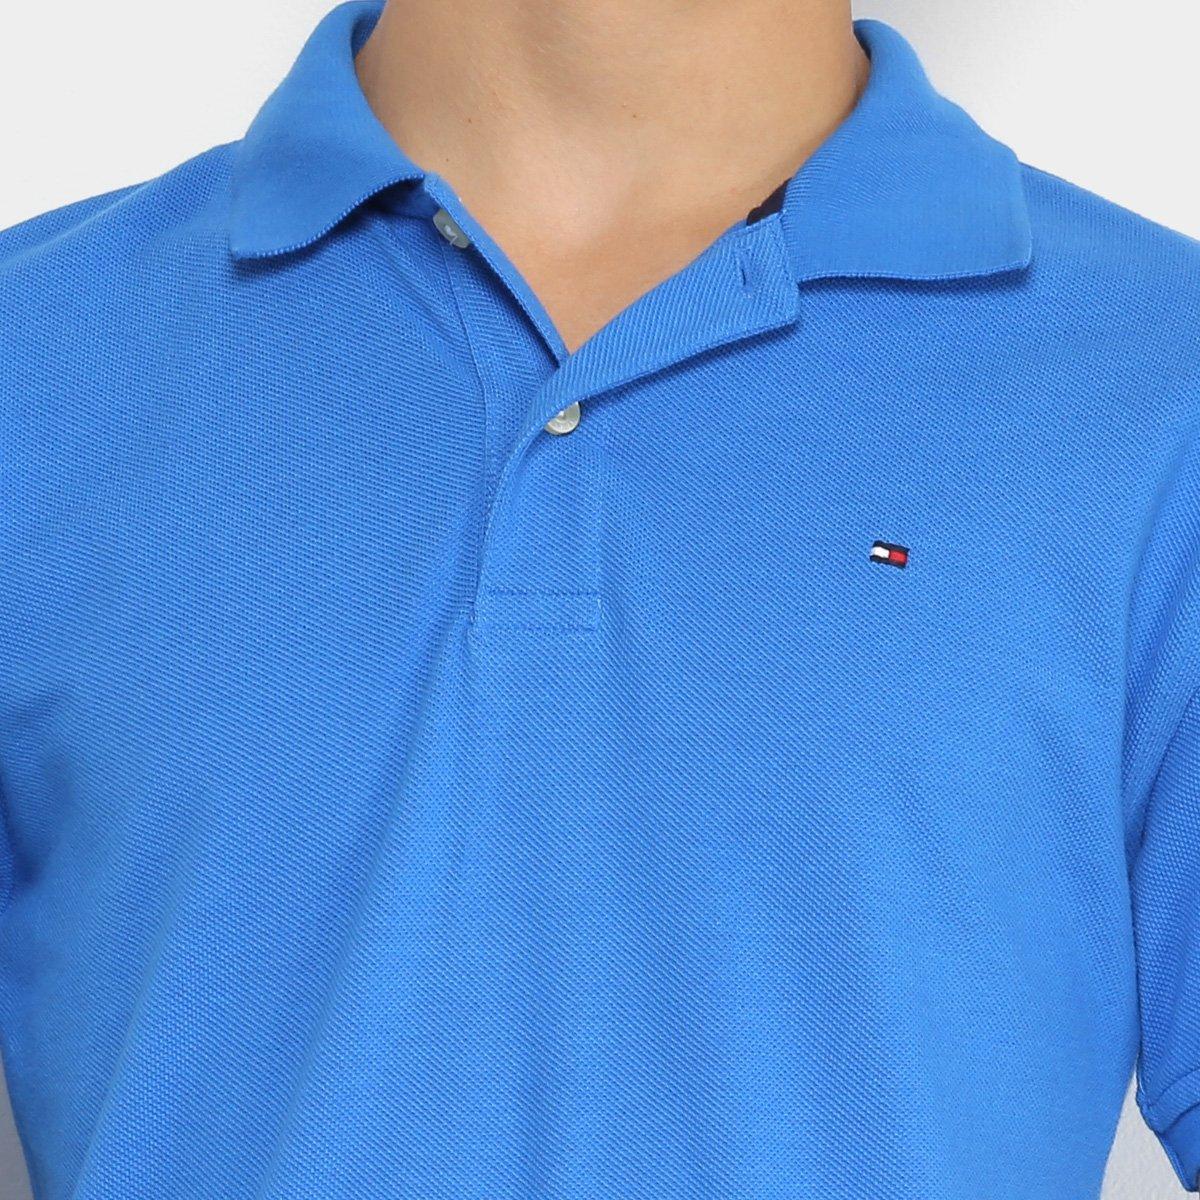 7e46f62e140abc  Camisa Polo Infantil Tommy Hilfiger Knit New Masculina -  Azul Royal . a01514893917e